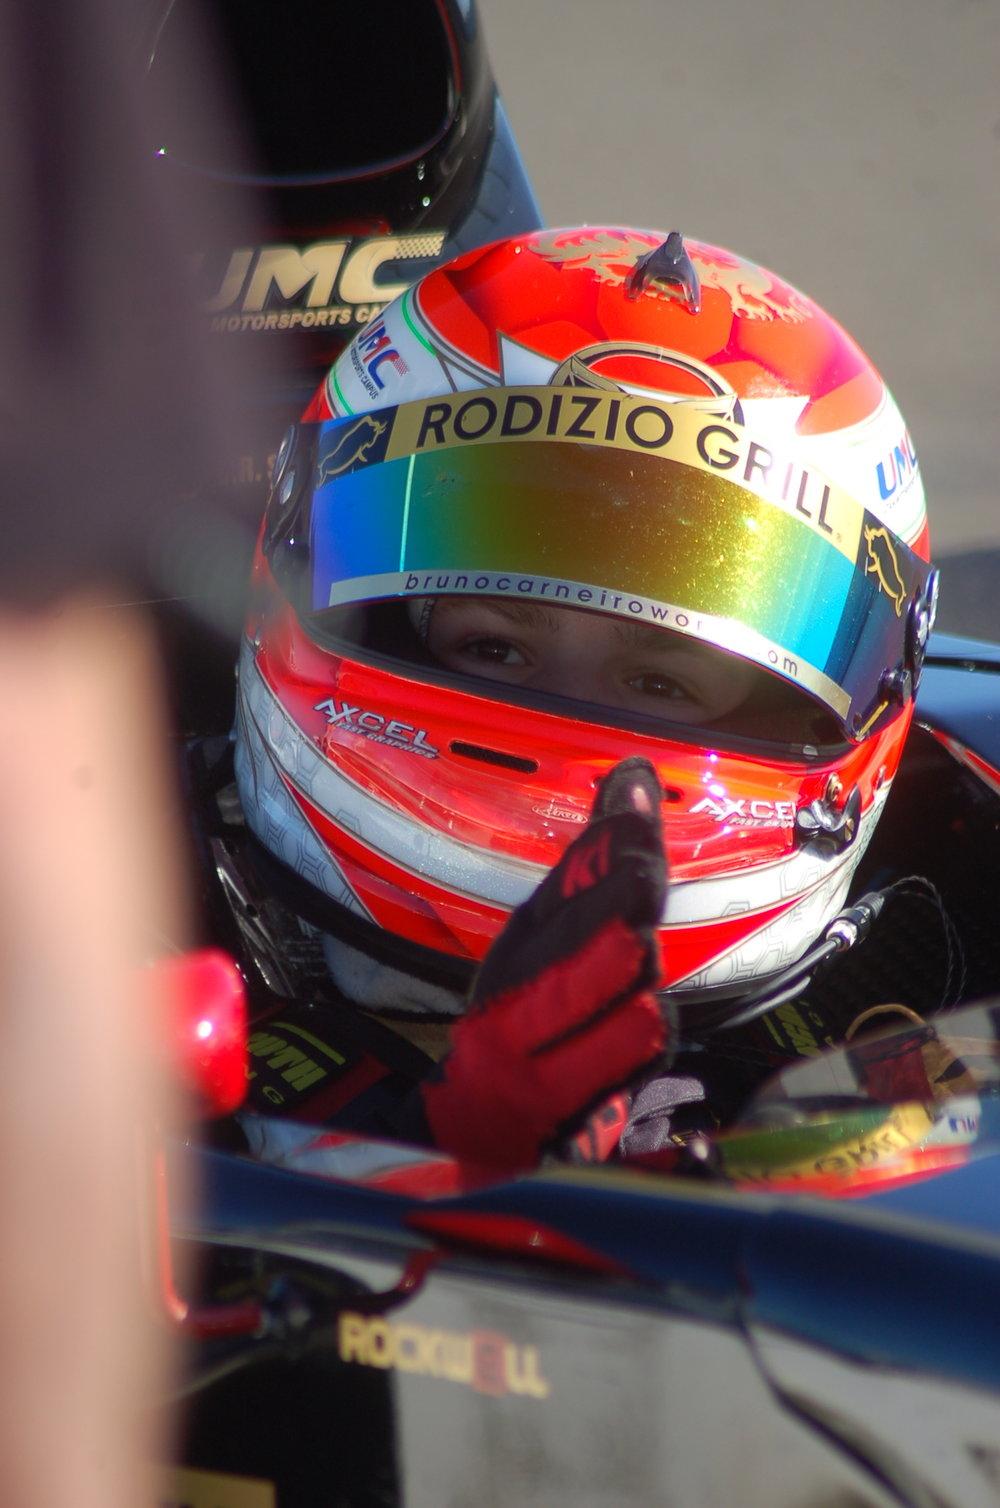 Bruno Carneiro talks to his race engineer Ian Lacy via radio at Thunderhill Raceway (Apr.2016) Photo by Ge Ferreira